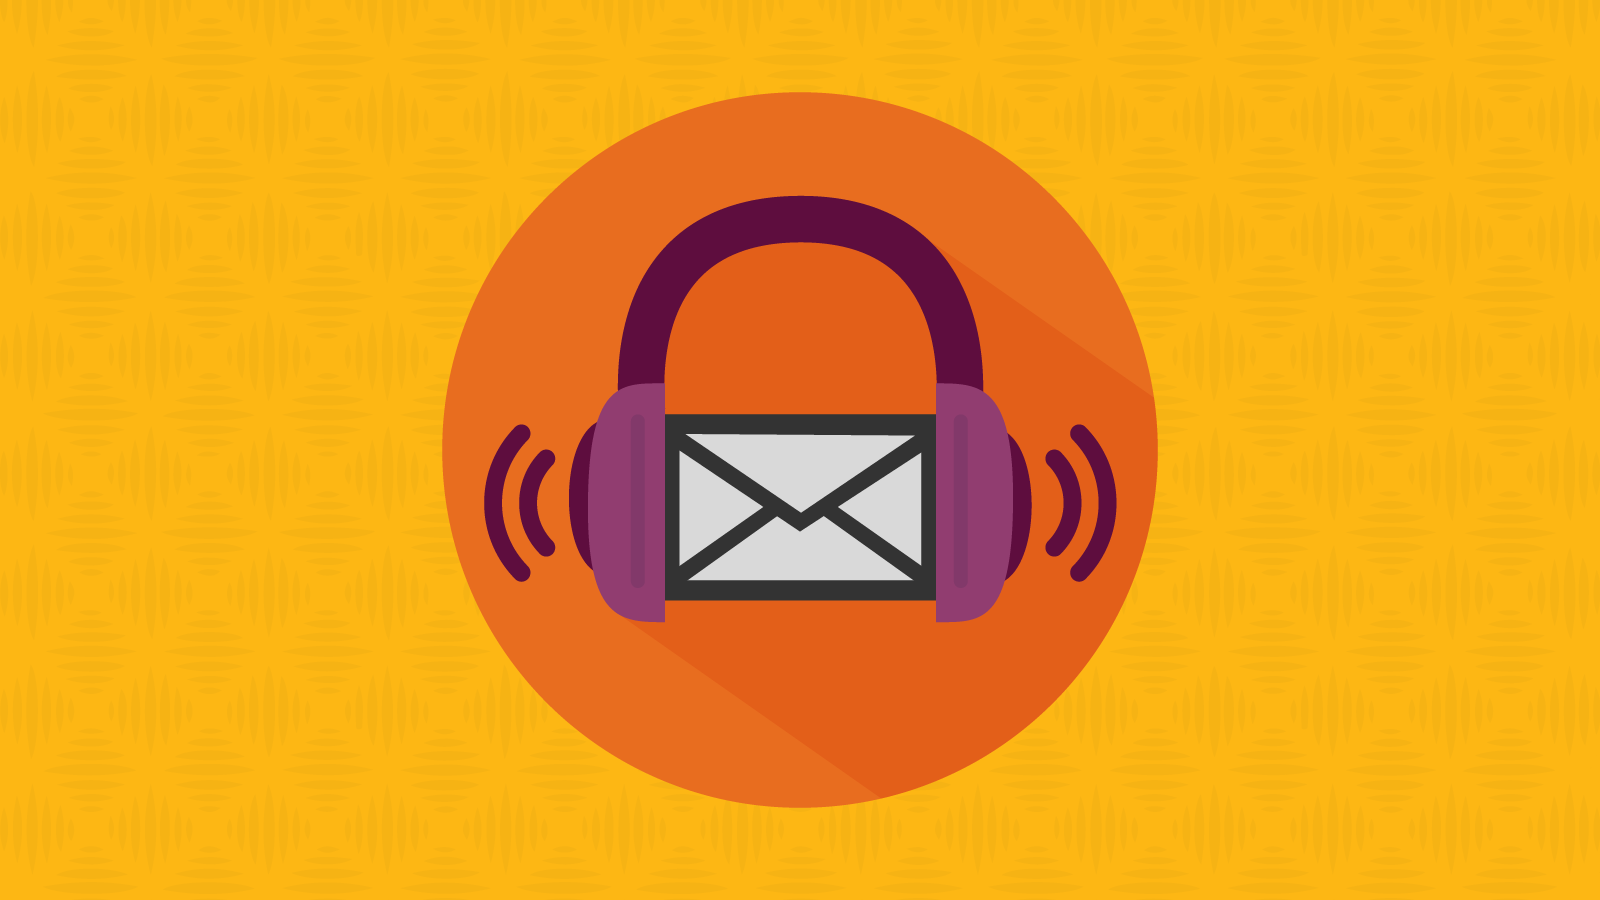 Email envelope wearing headphones, listening to screen reader